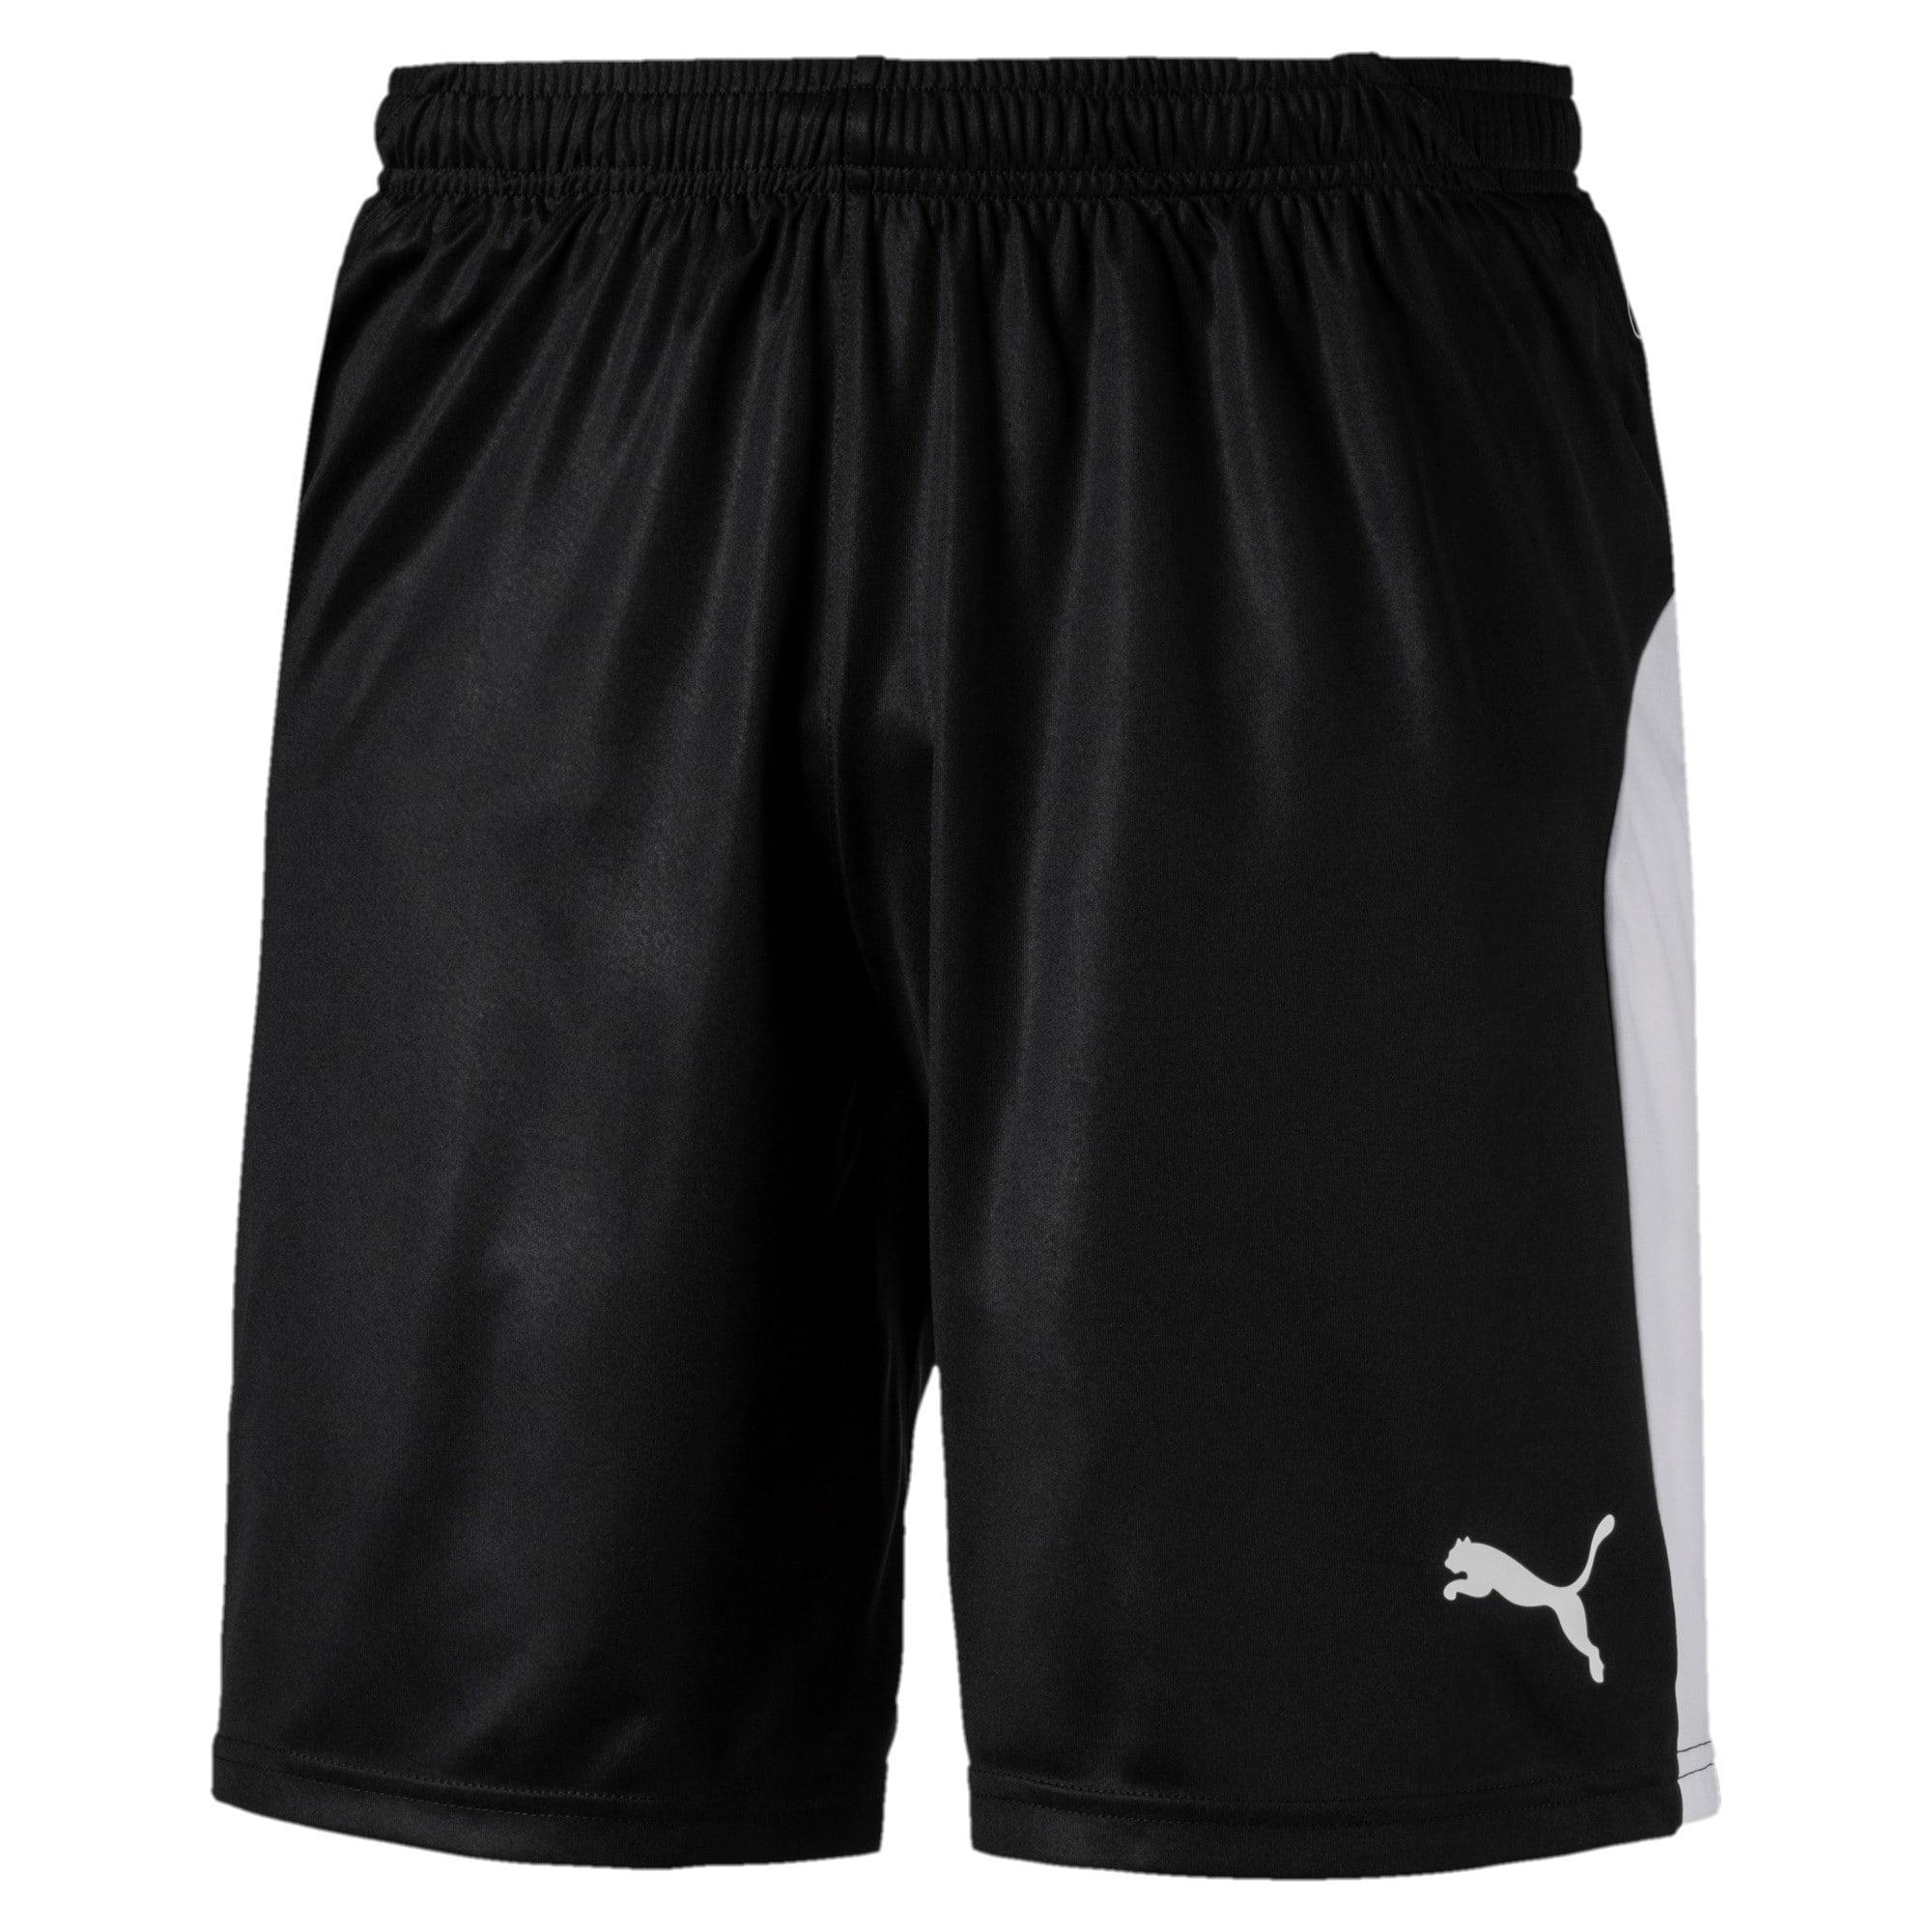 Thumbnail 1 of LIGA Men's Shorts, Puma Black-Puma White, medium